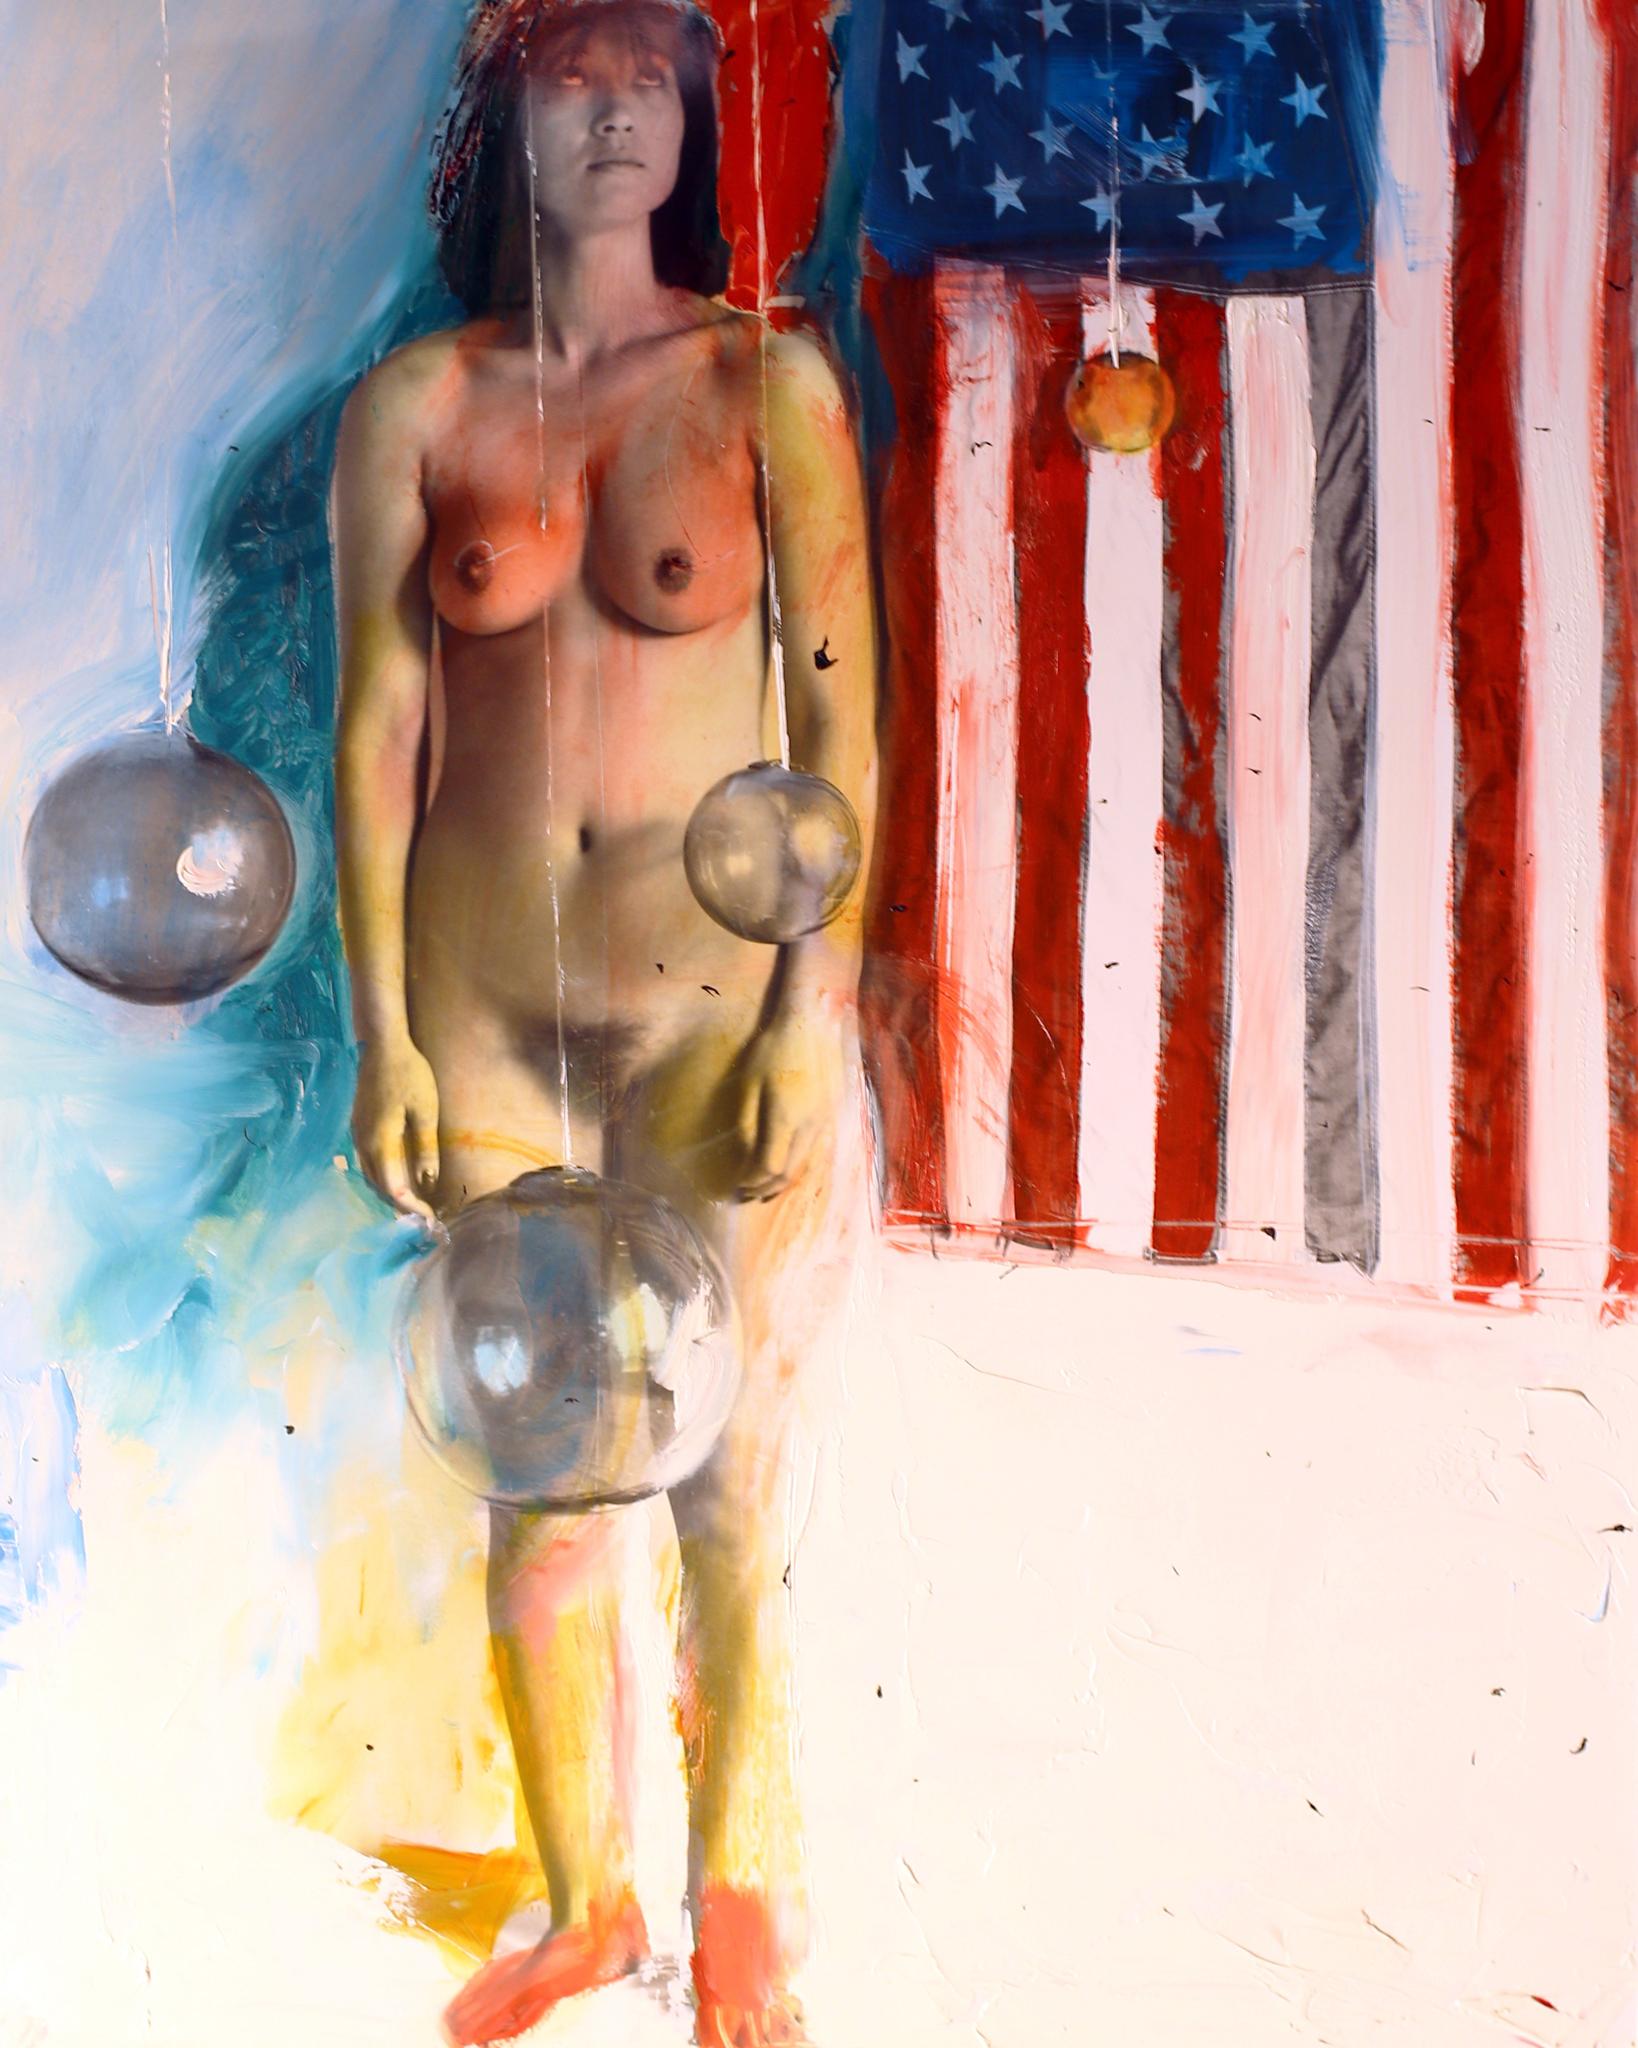 Kim-Weston-Painted-16x20-3.jpg